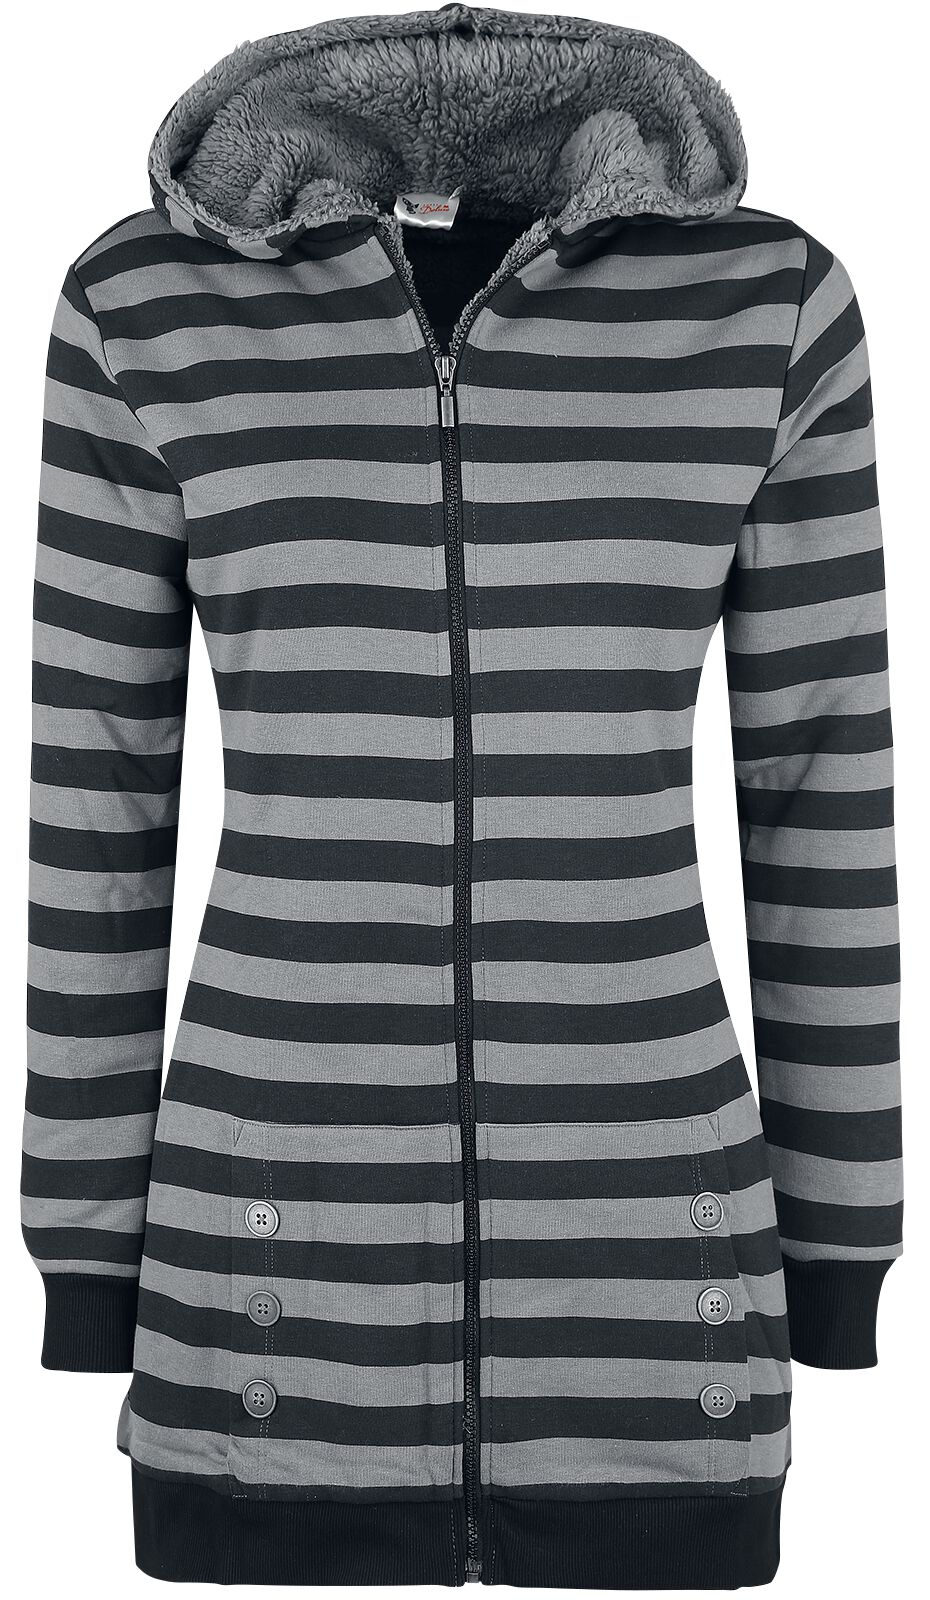 Image of   Pussy Deluxe Teddy Fleece Coat Girlie hættejakke sort-grå